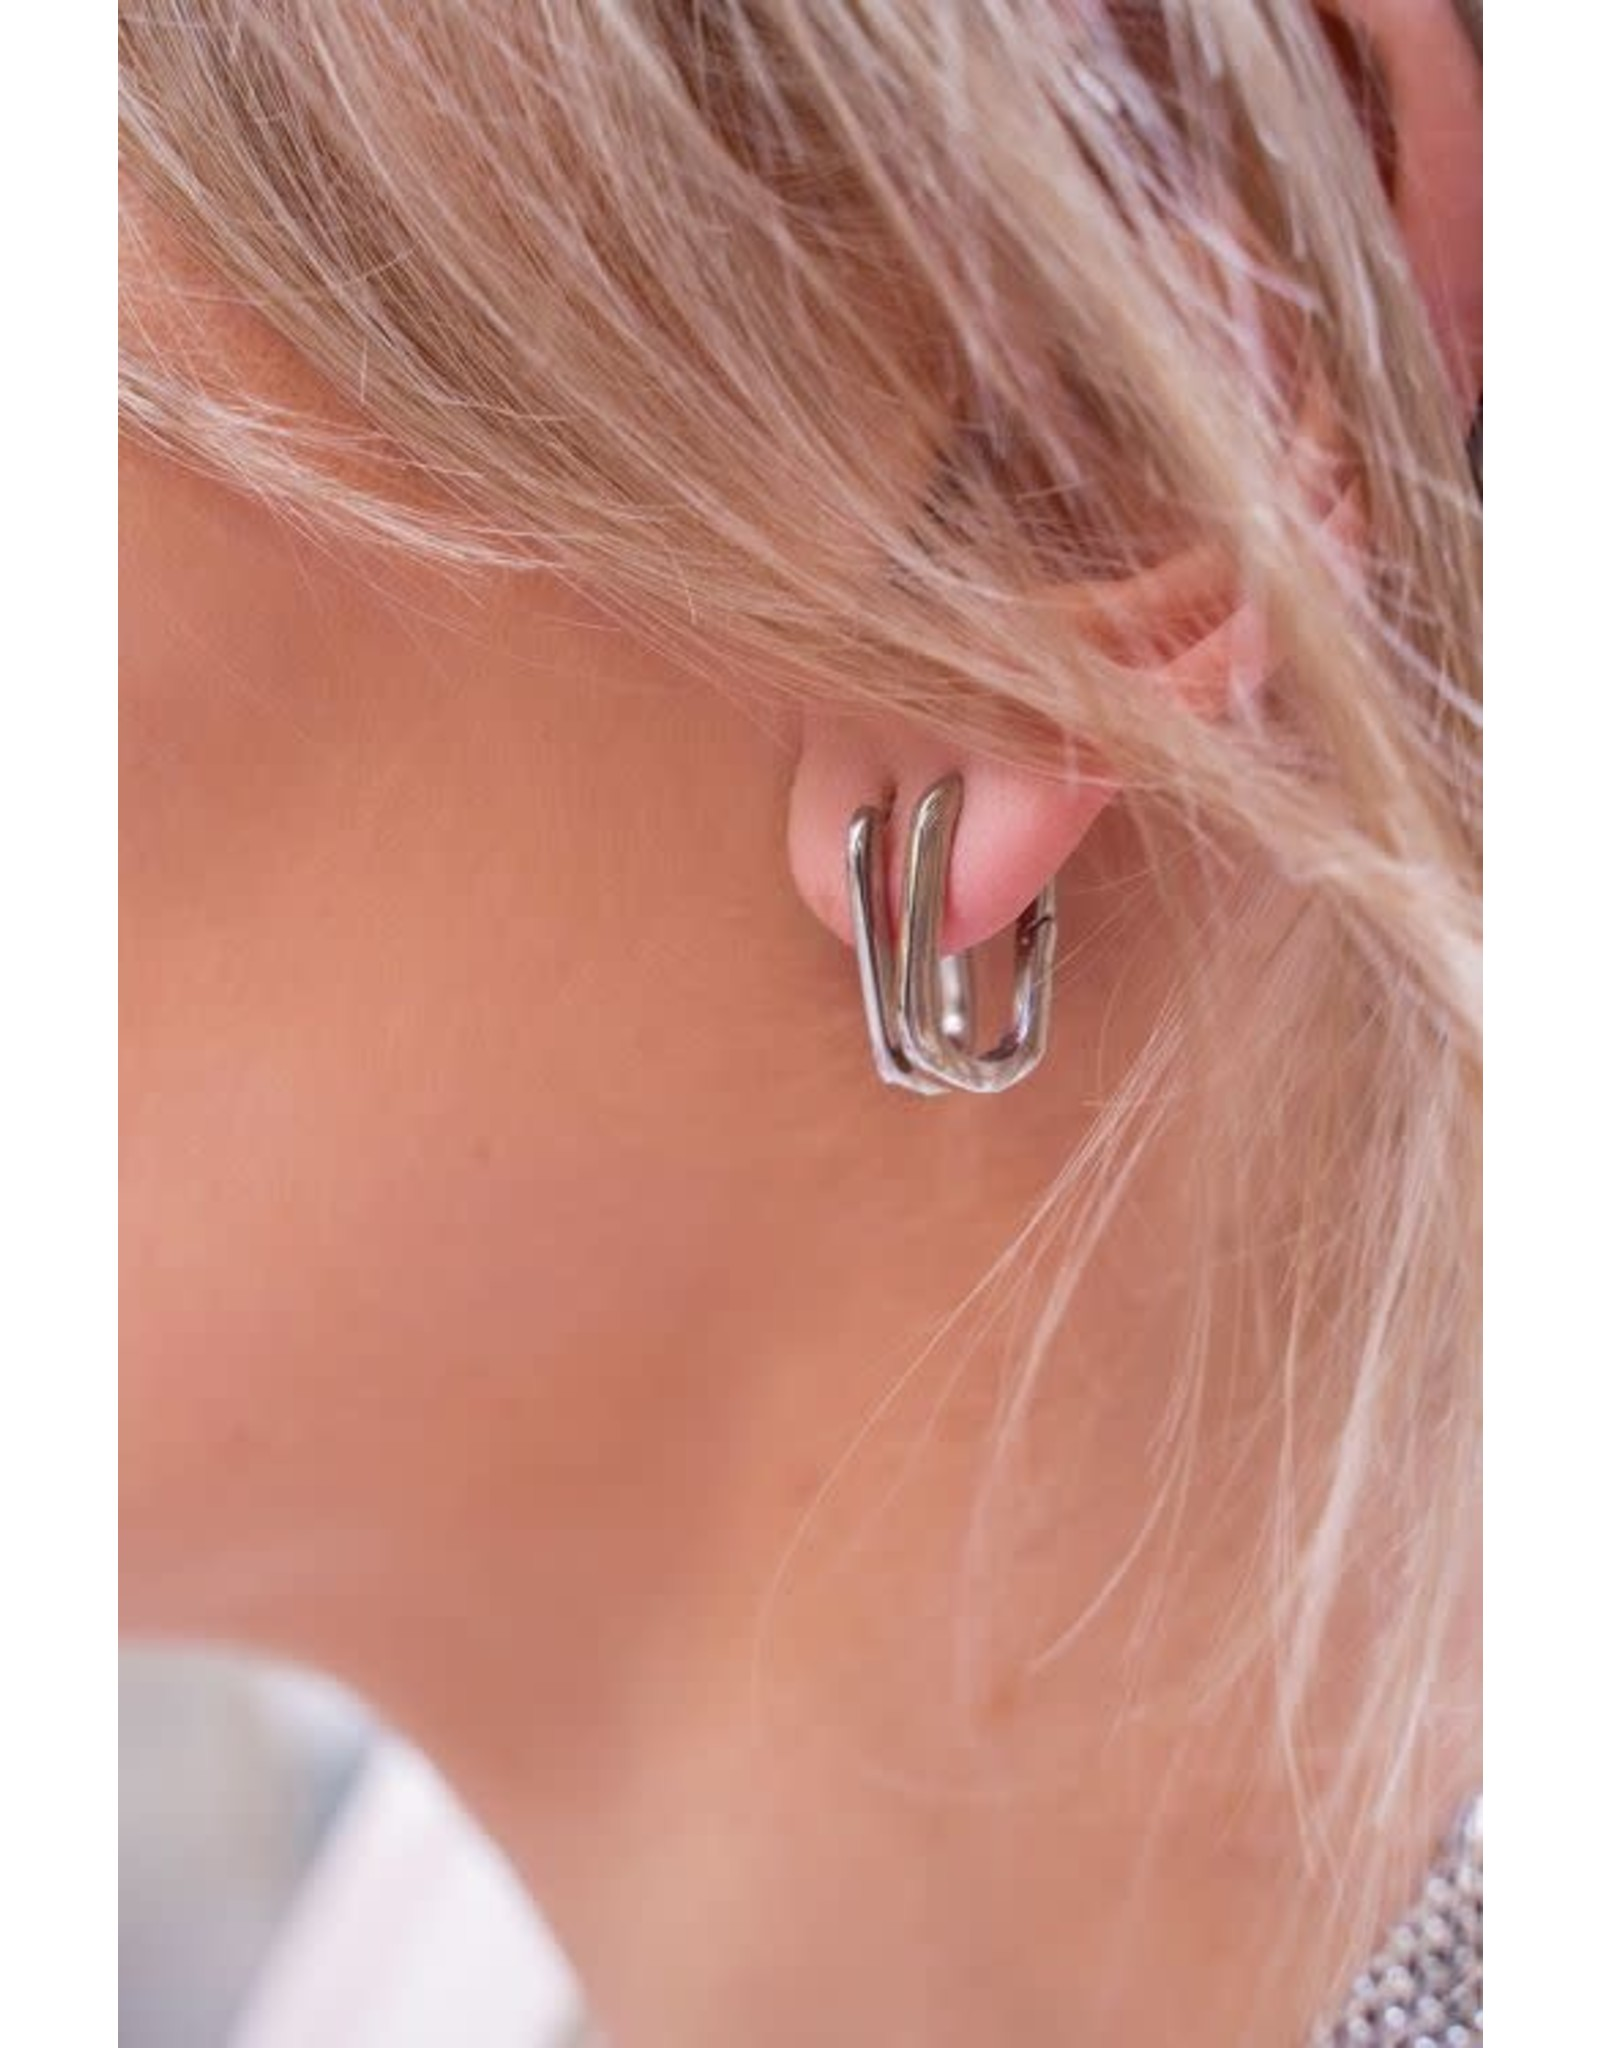 My Jewellery My Jewellery oorbellen ovaal groot